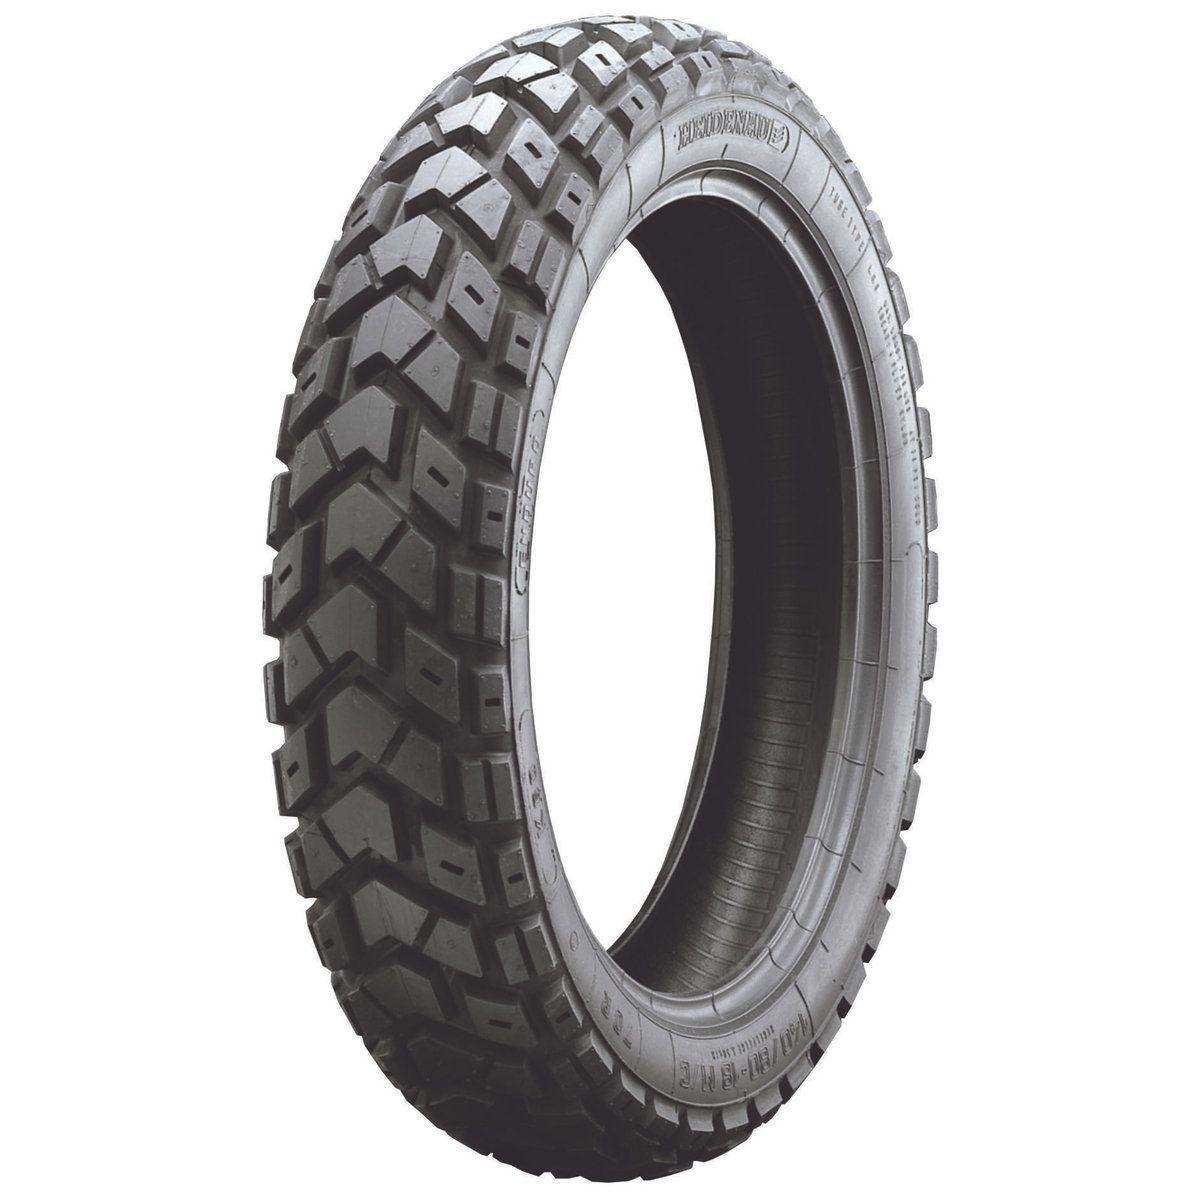 Heidenau K60 Scout Tires 20 (50.00) Off Dual sport